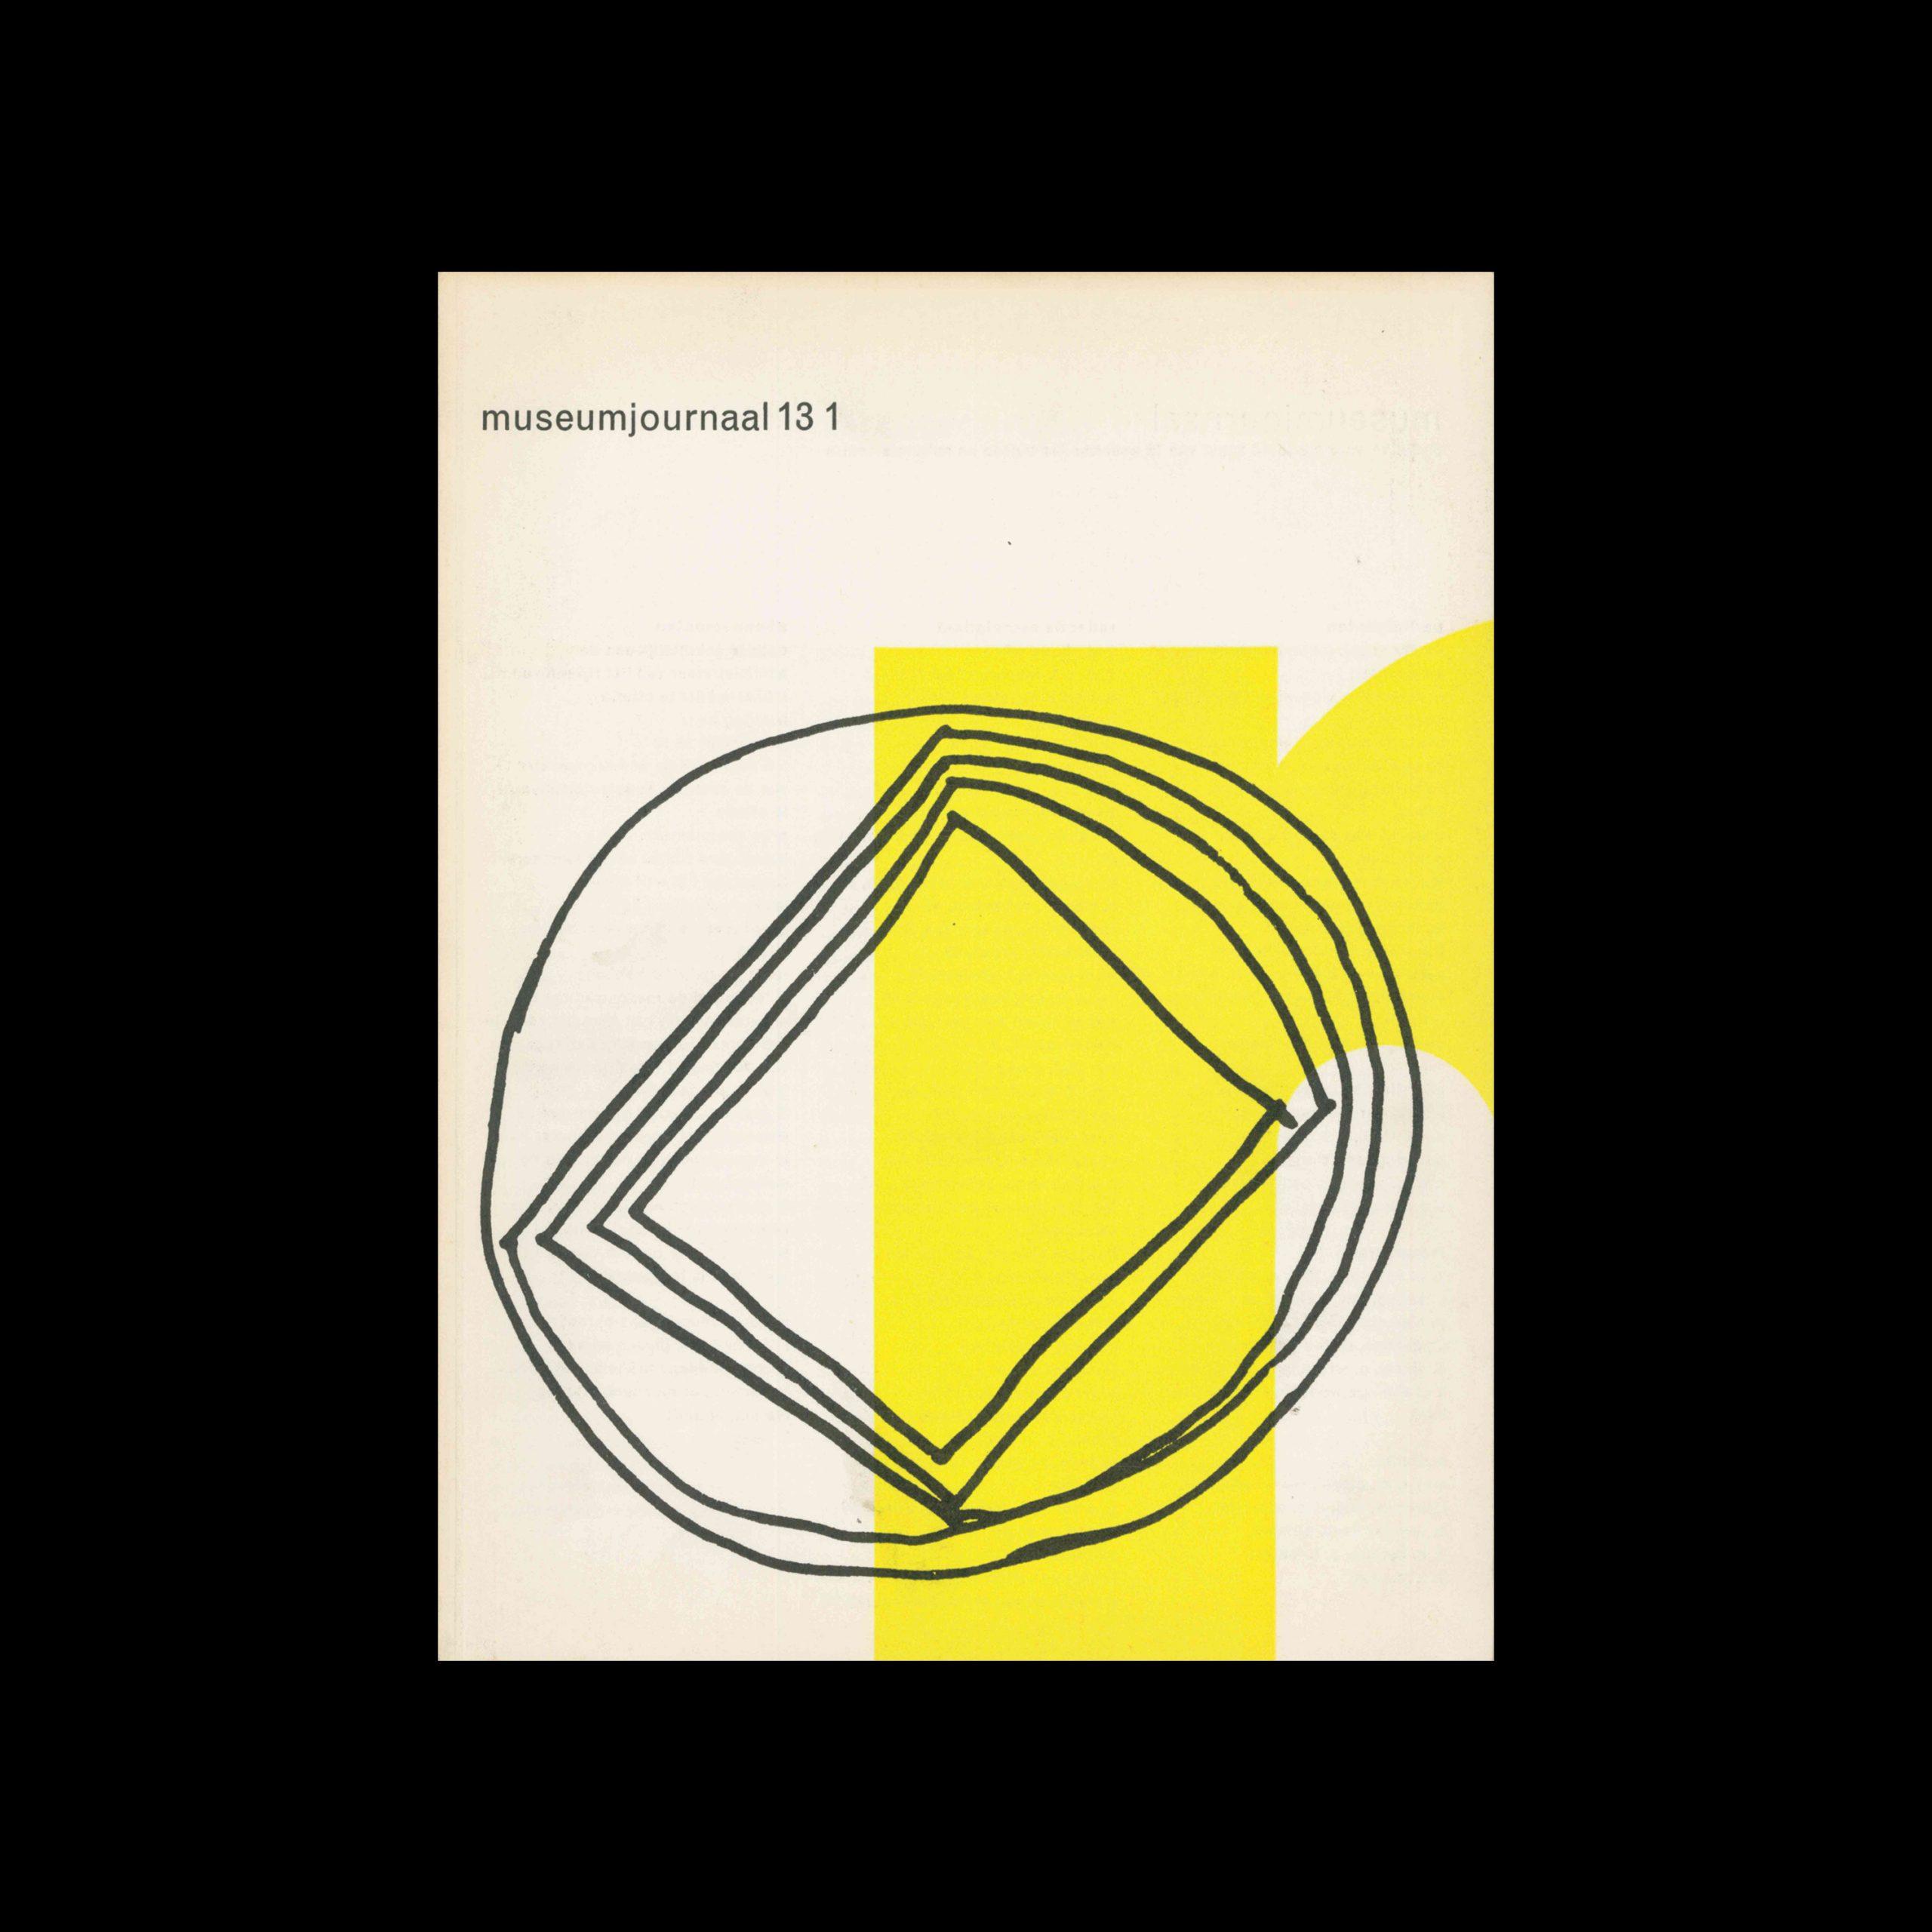 Museumjournaal, Serie 13 no1, 1968.Designed by Jurriaan Schrofer.